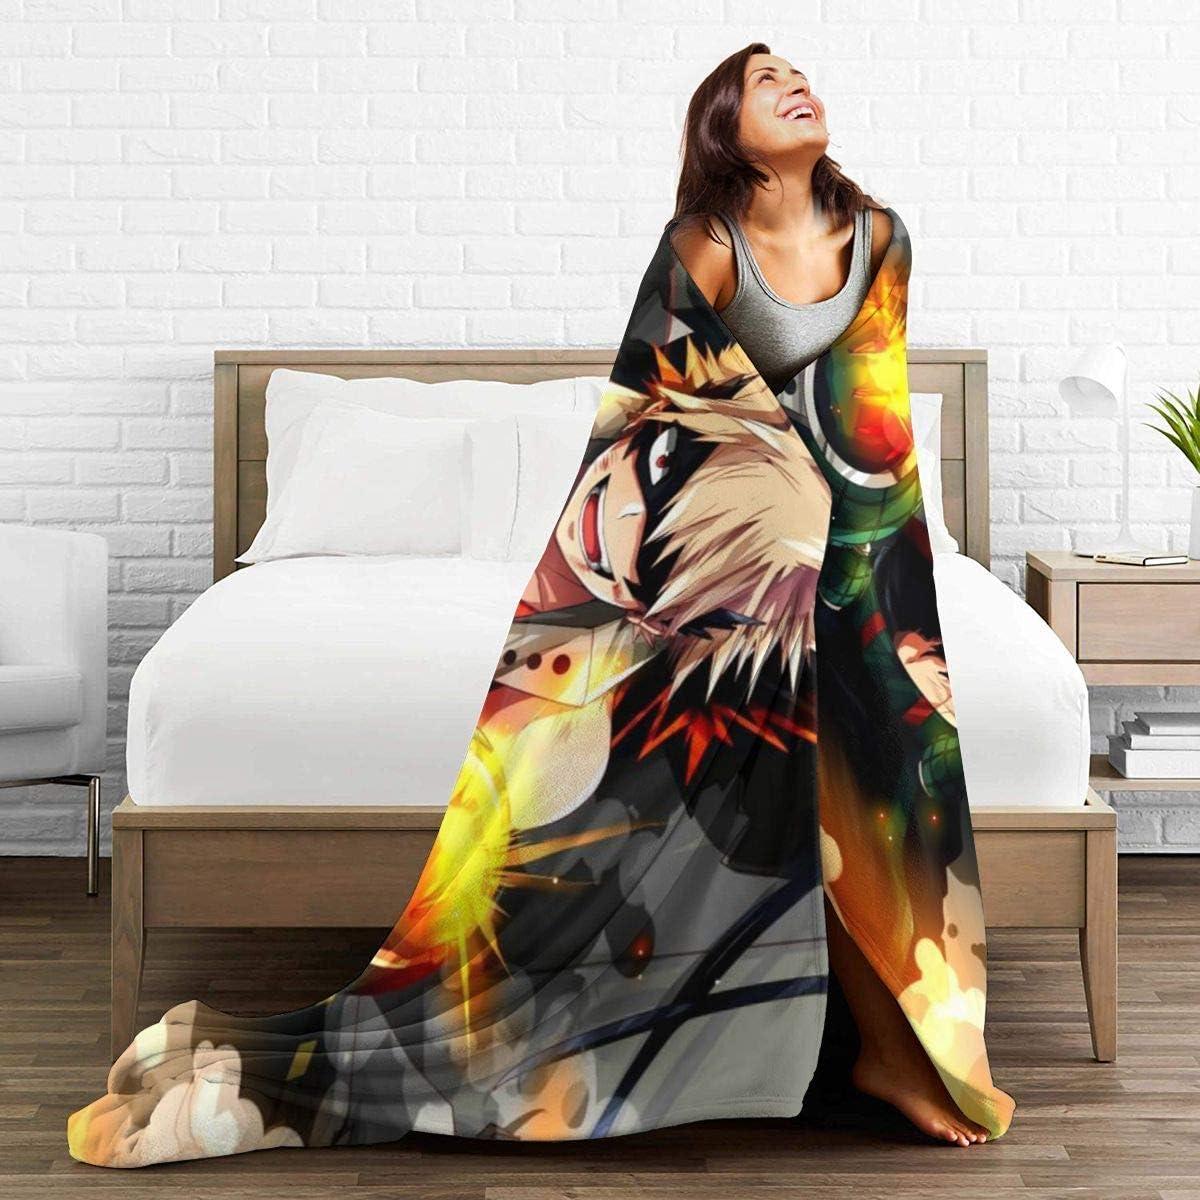 Ultra Soft Anime HeroAca Bnha Bakugou Katsuki Blasting Poster Decorative Blanket Thick Better Sleep Engshi Coperte e trapunte Flannel Fleece Throw Blanket for Winter Work Yoga